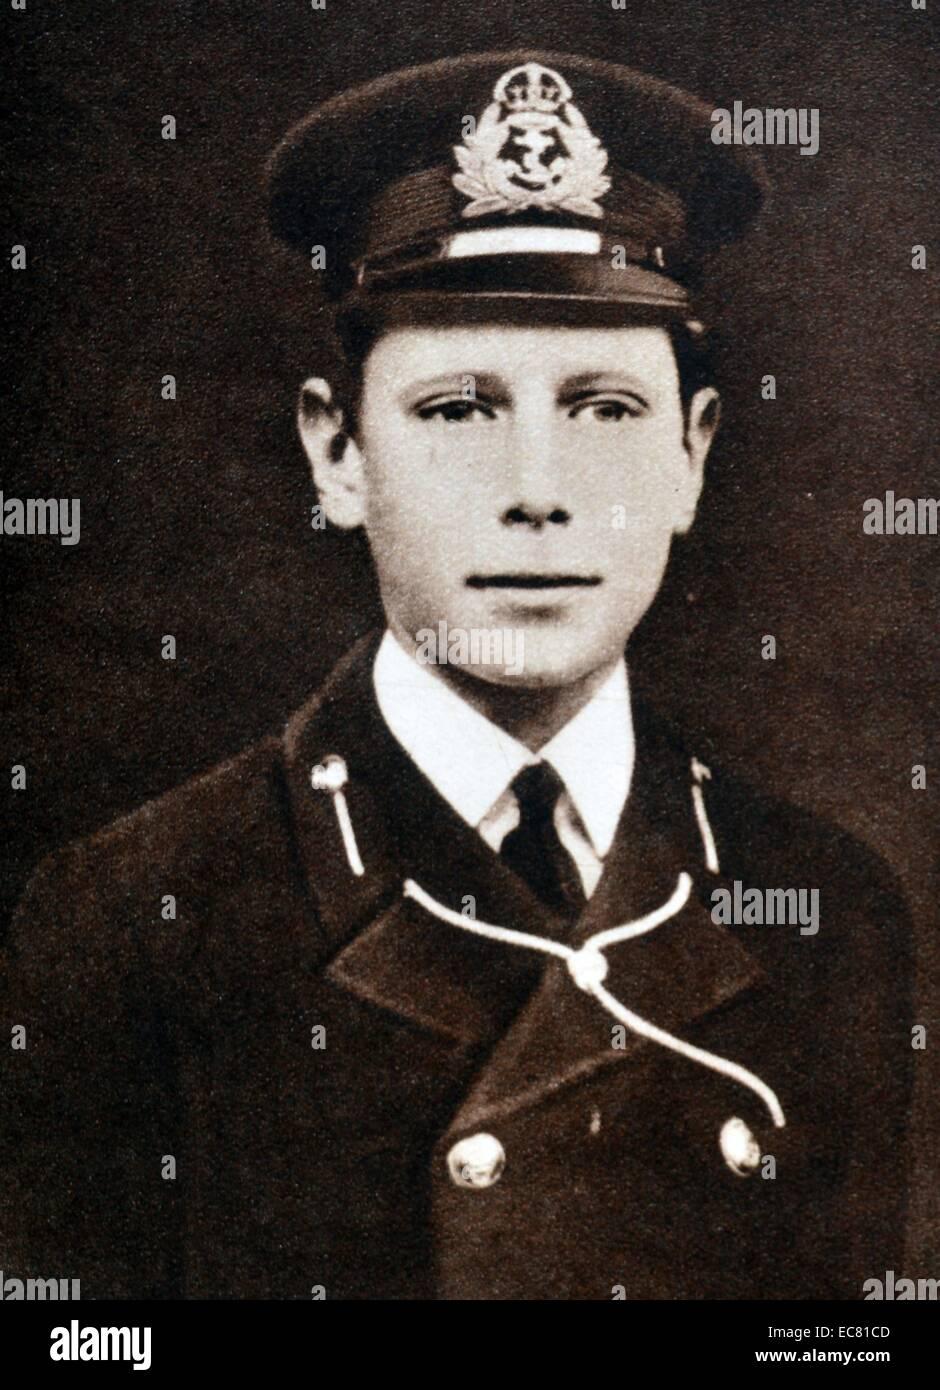 Prince Albert (later King George VI) - Stock Image